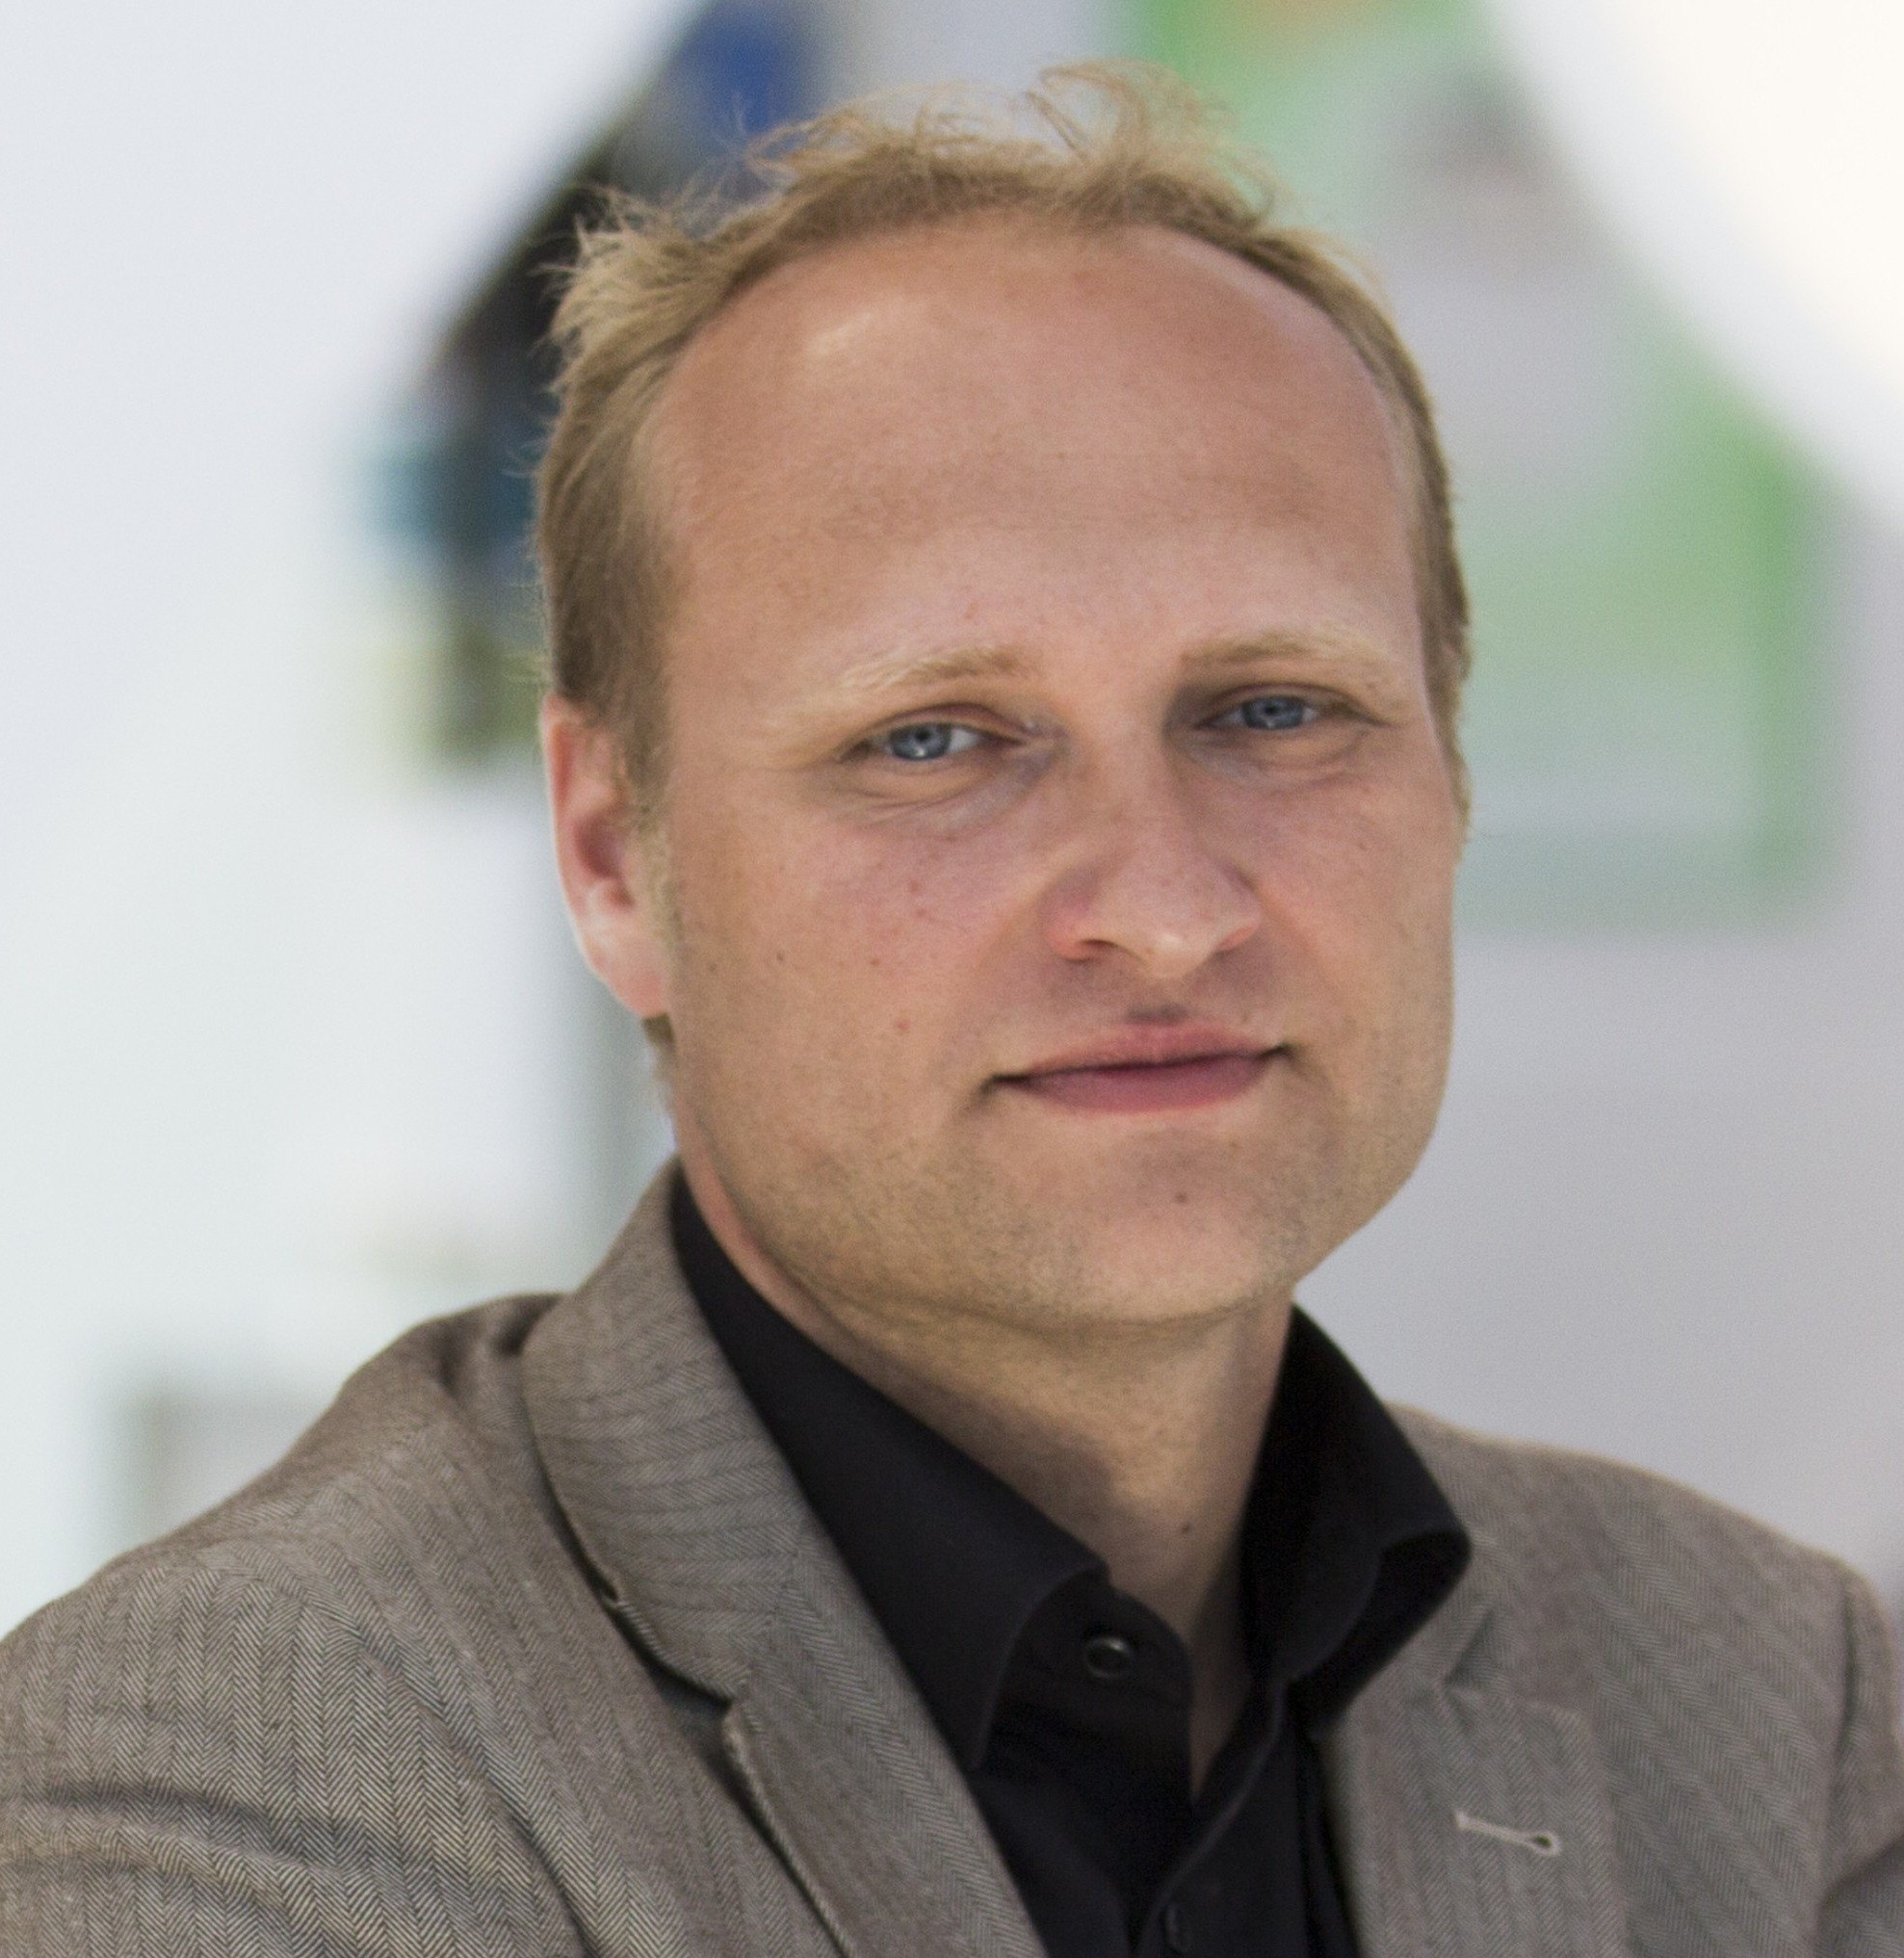 Henri Versteeg, PhD